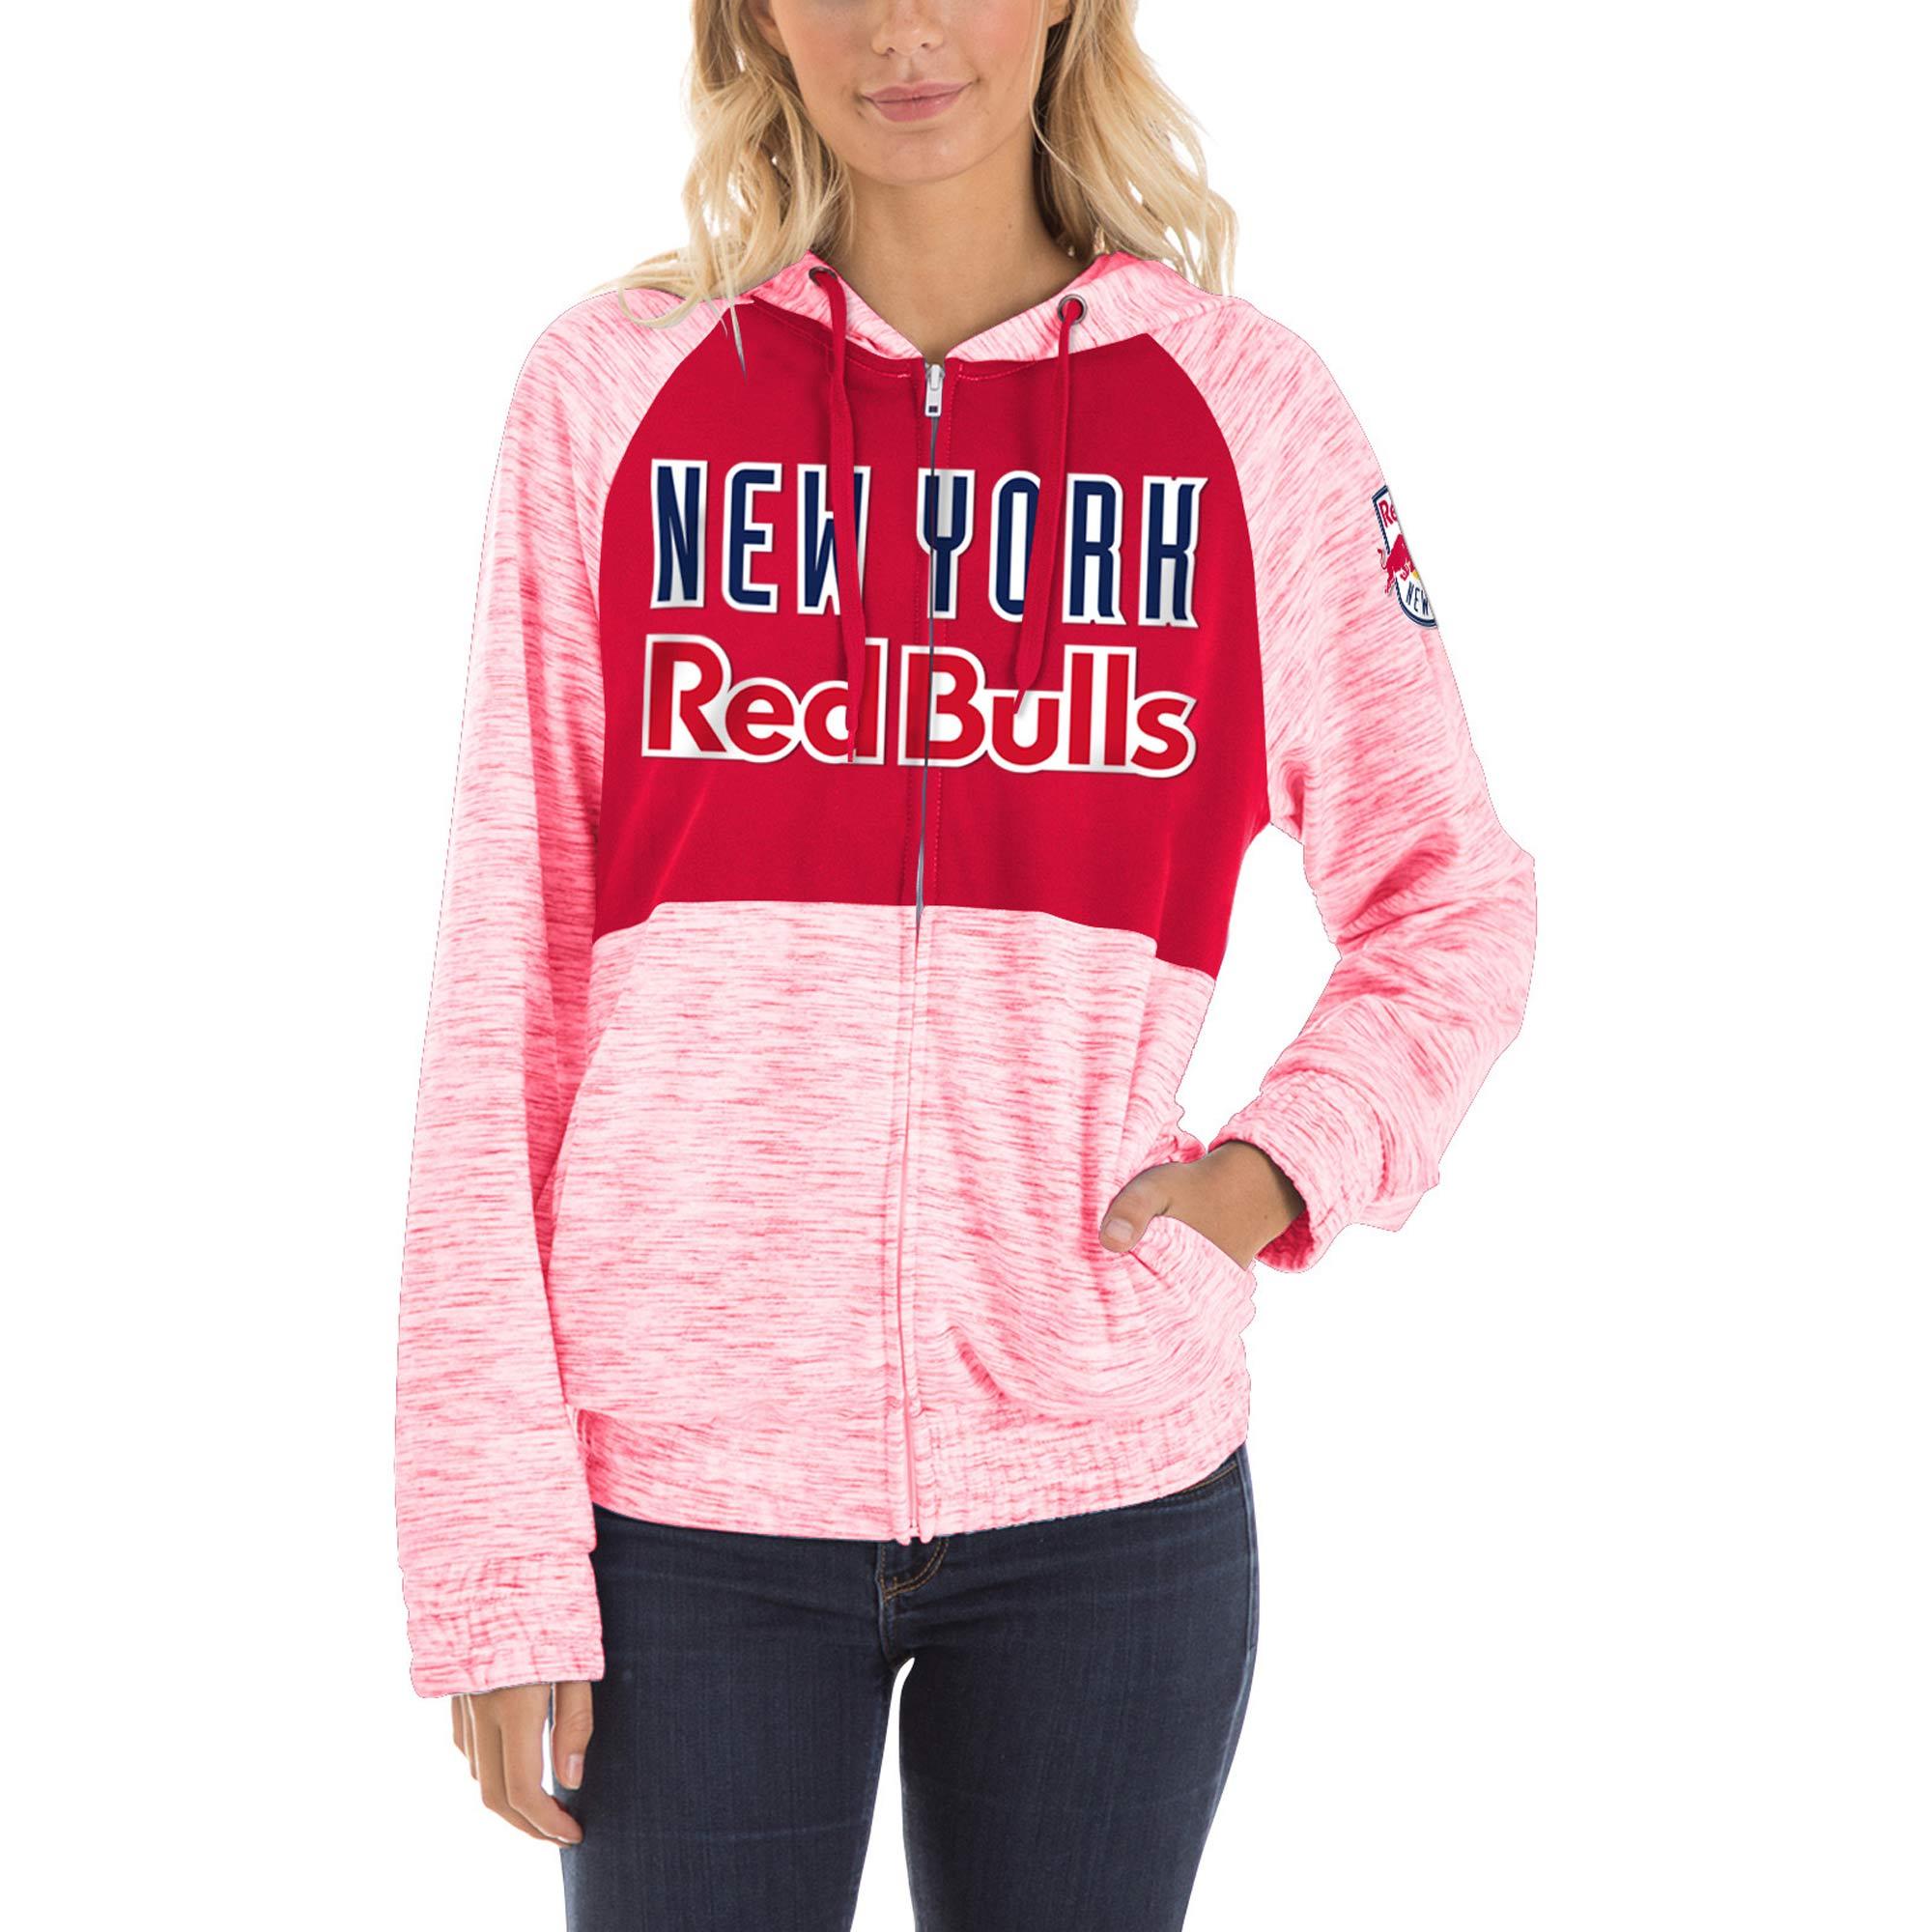 New York Red Bulls 5th & Ocean by New Era Women's Novelty Space Dye Full-Zip Hoodie - Red